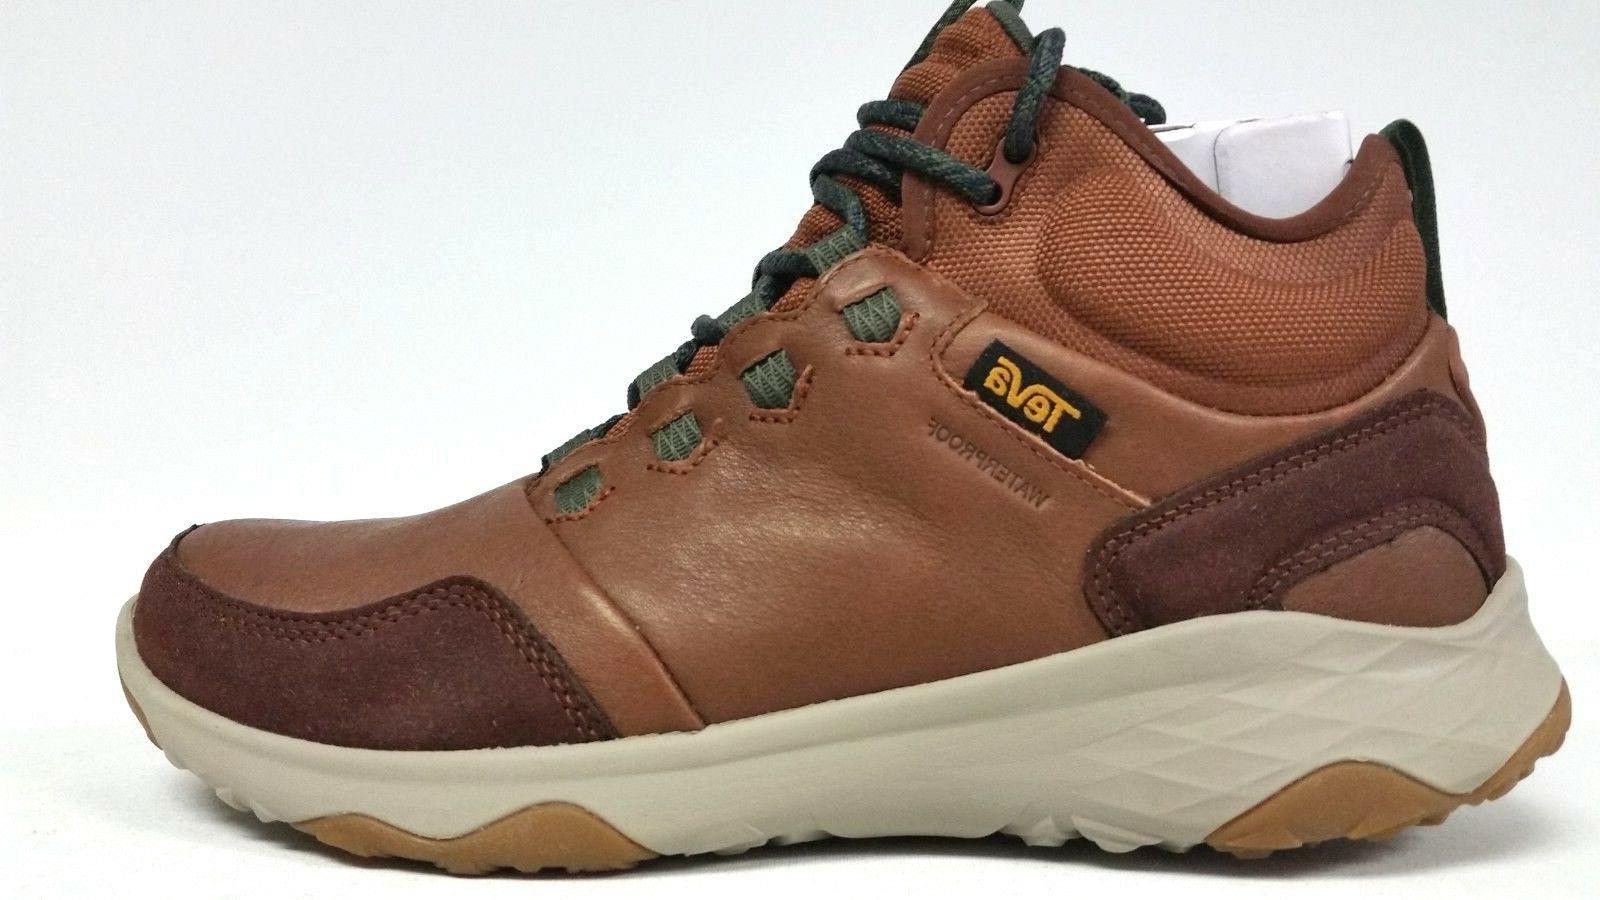 Teva Men's Arrowood 2 Mid Waterproof Hiking Boot - Size 9 -